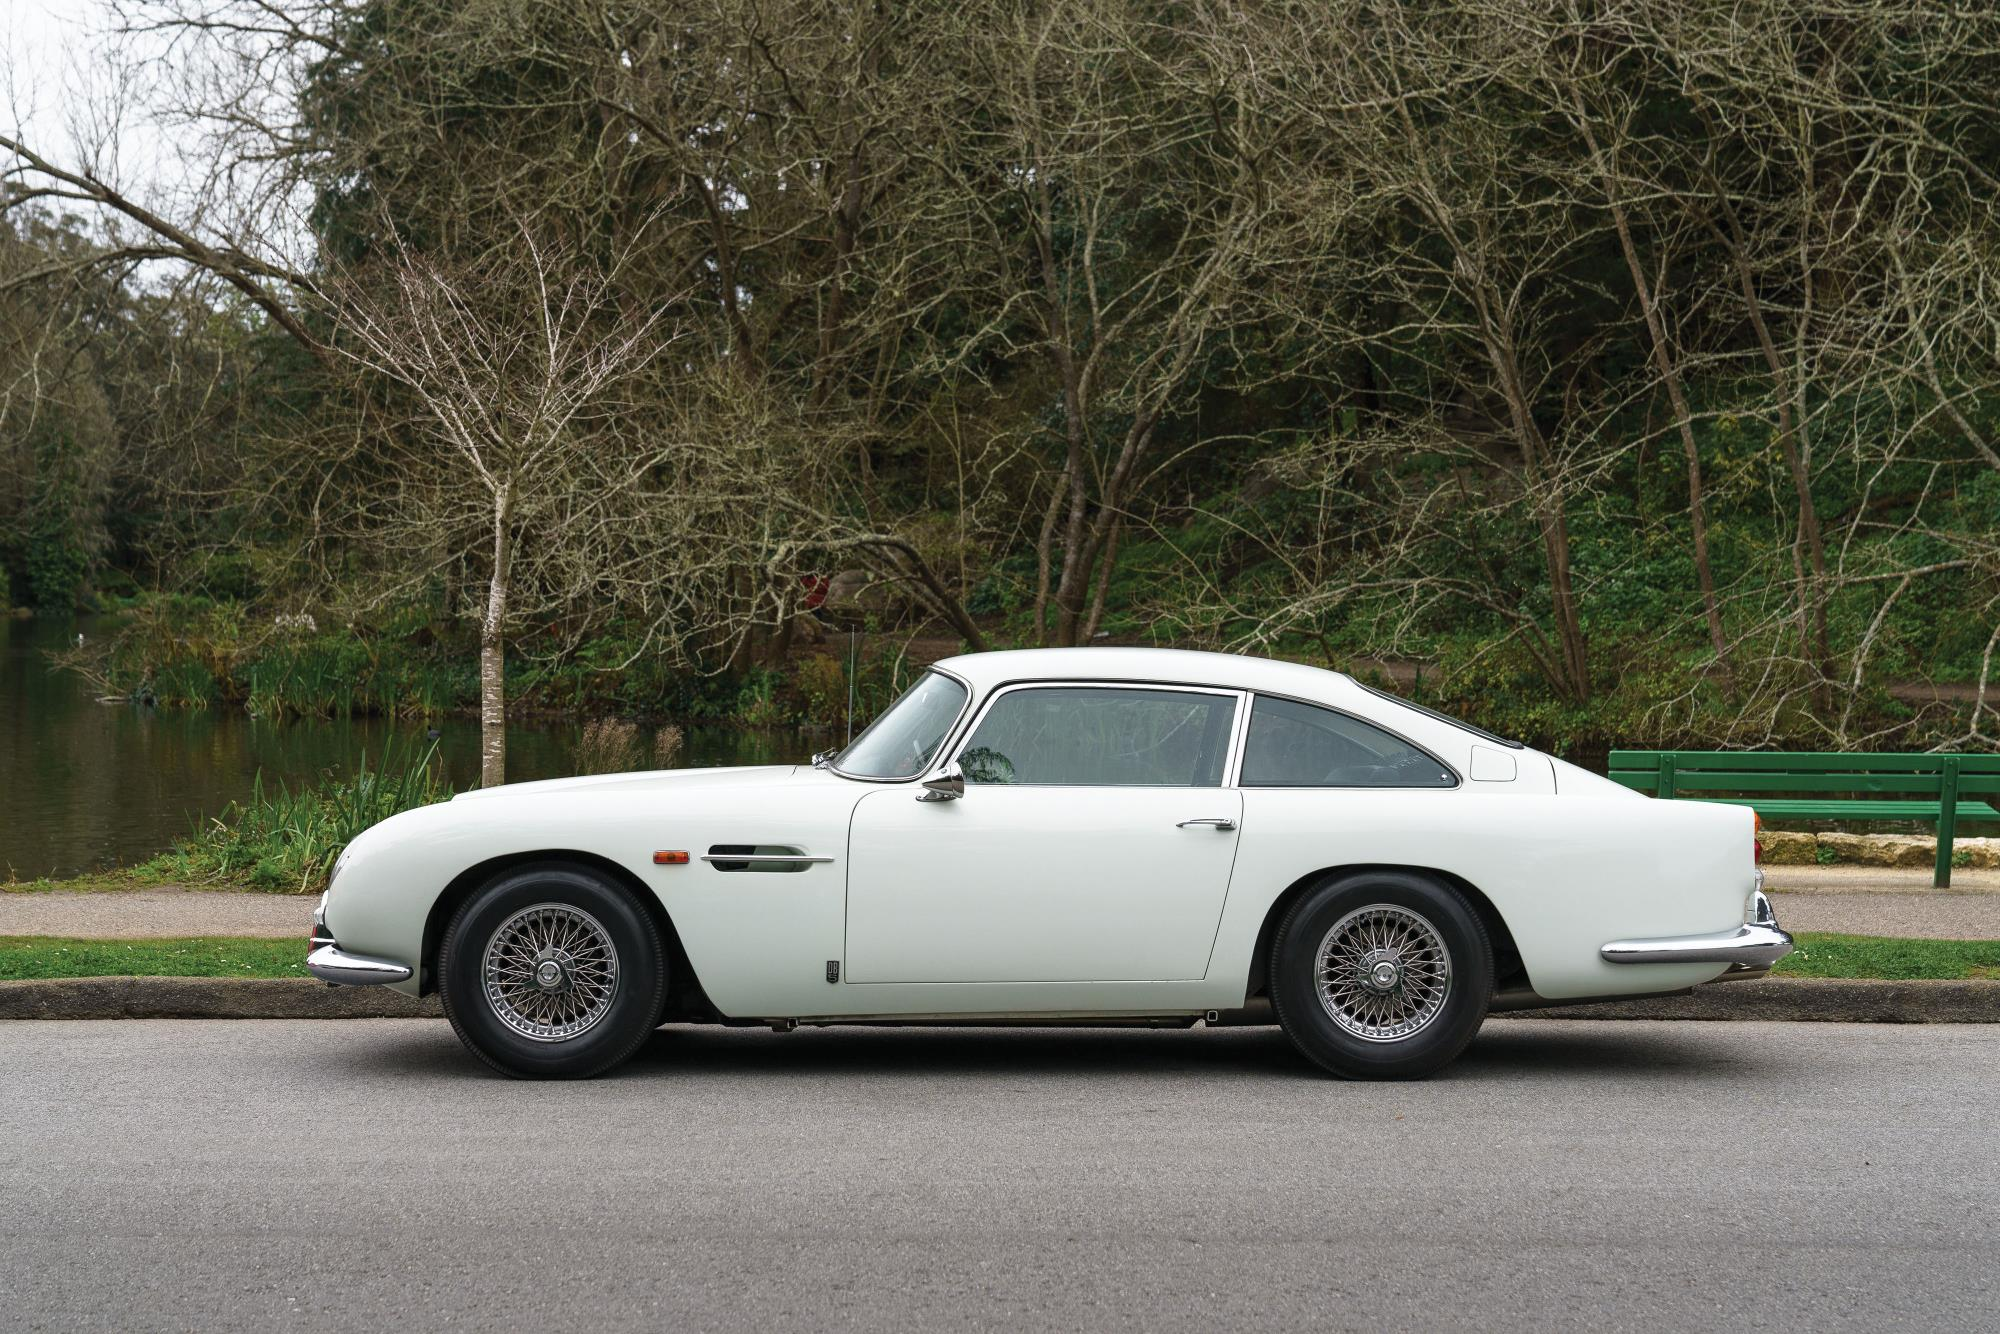 Aston Martin DB5 exterior